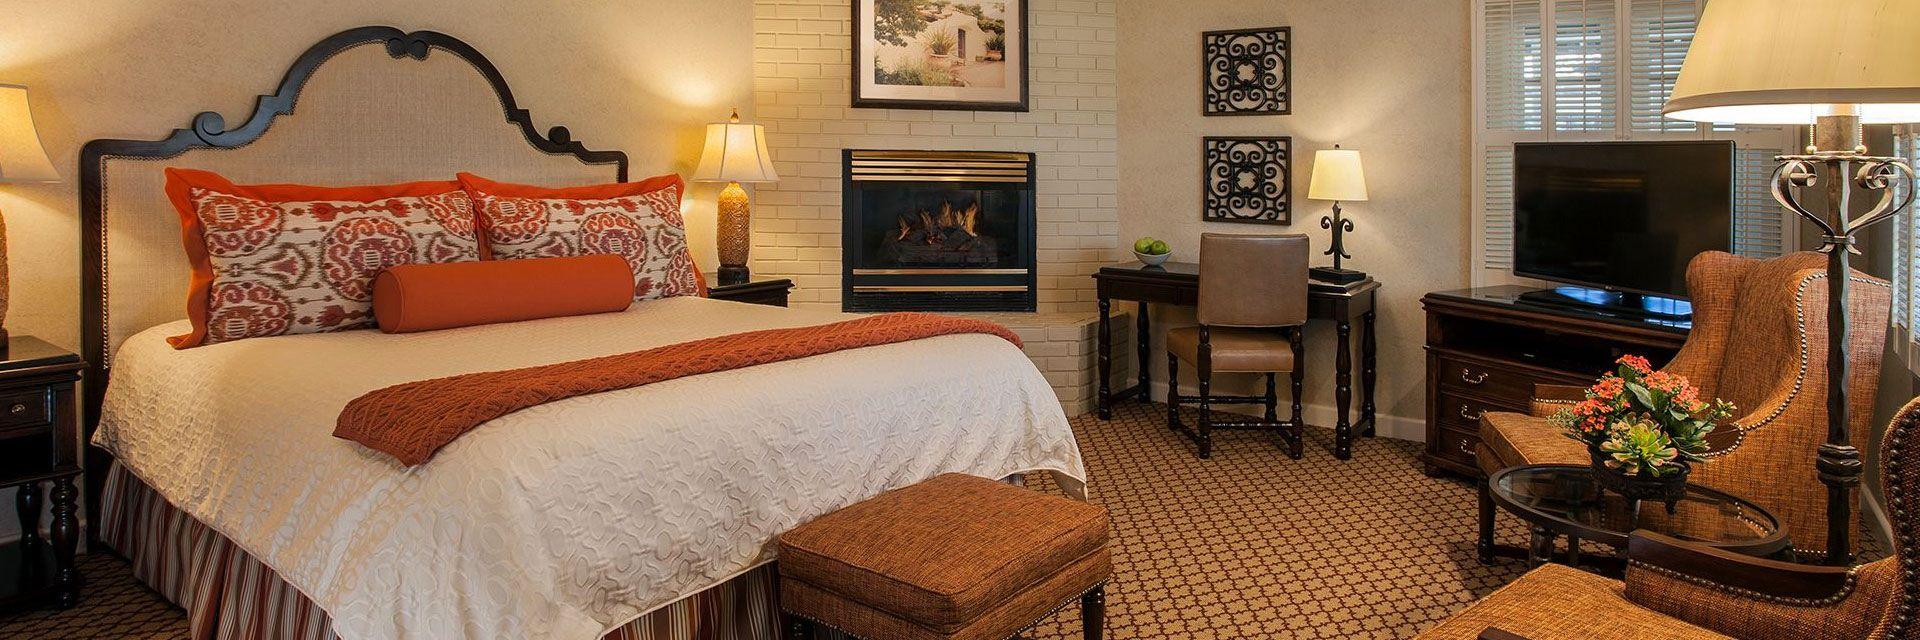 Best Rate Guarantee of Hotel Monterey